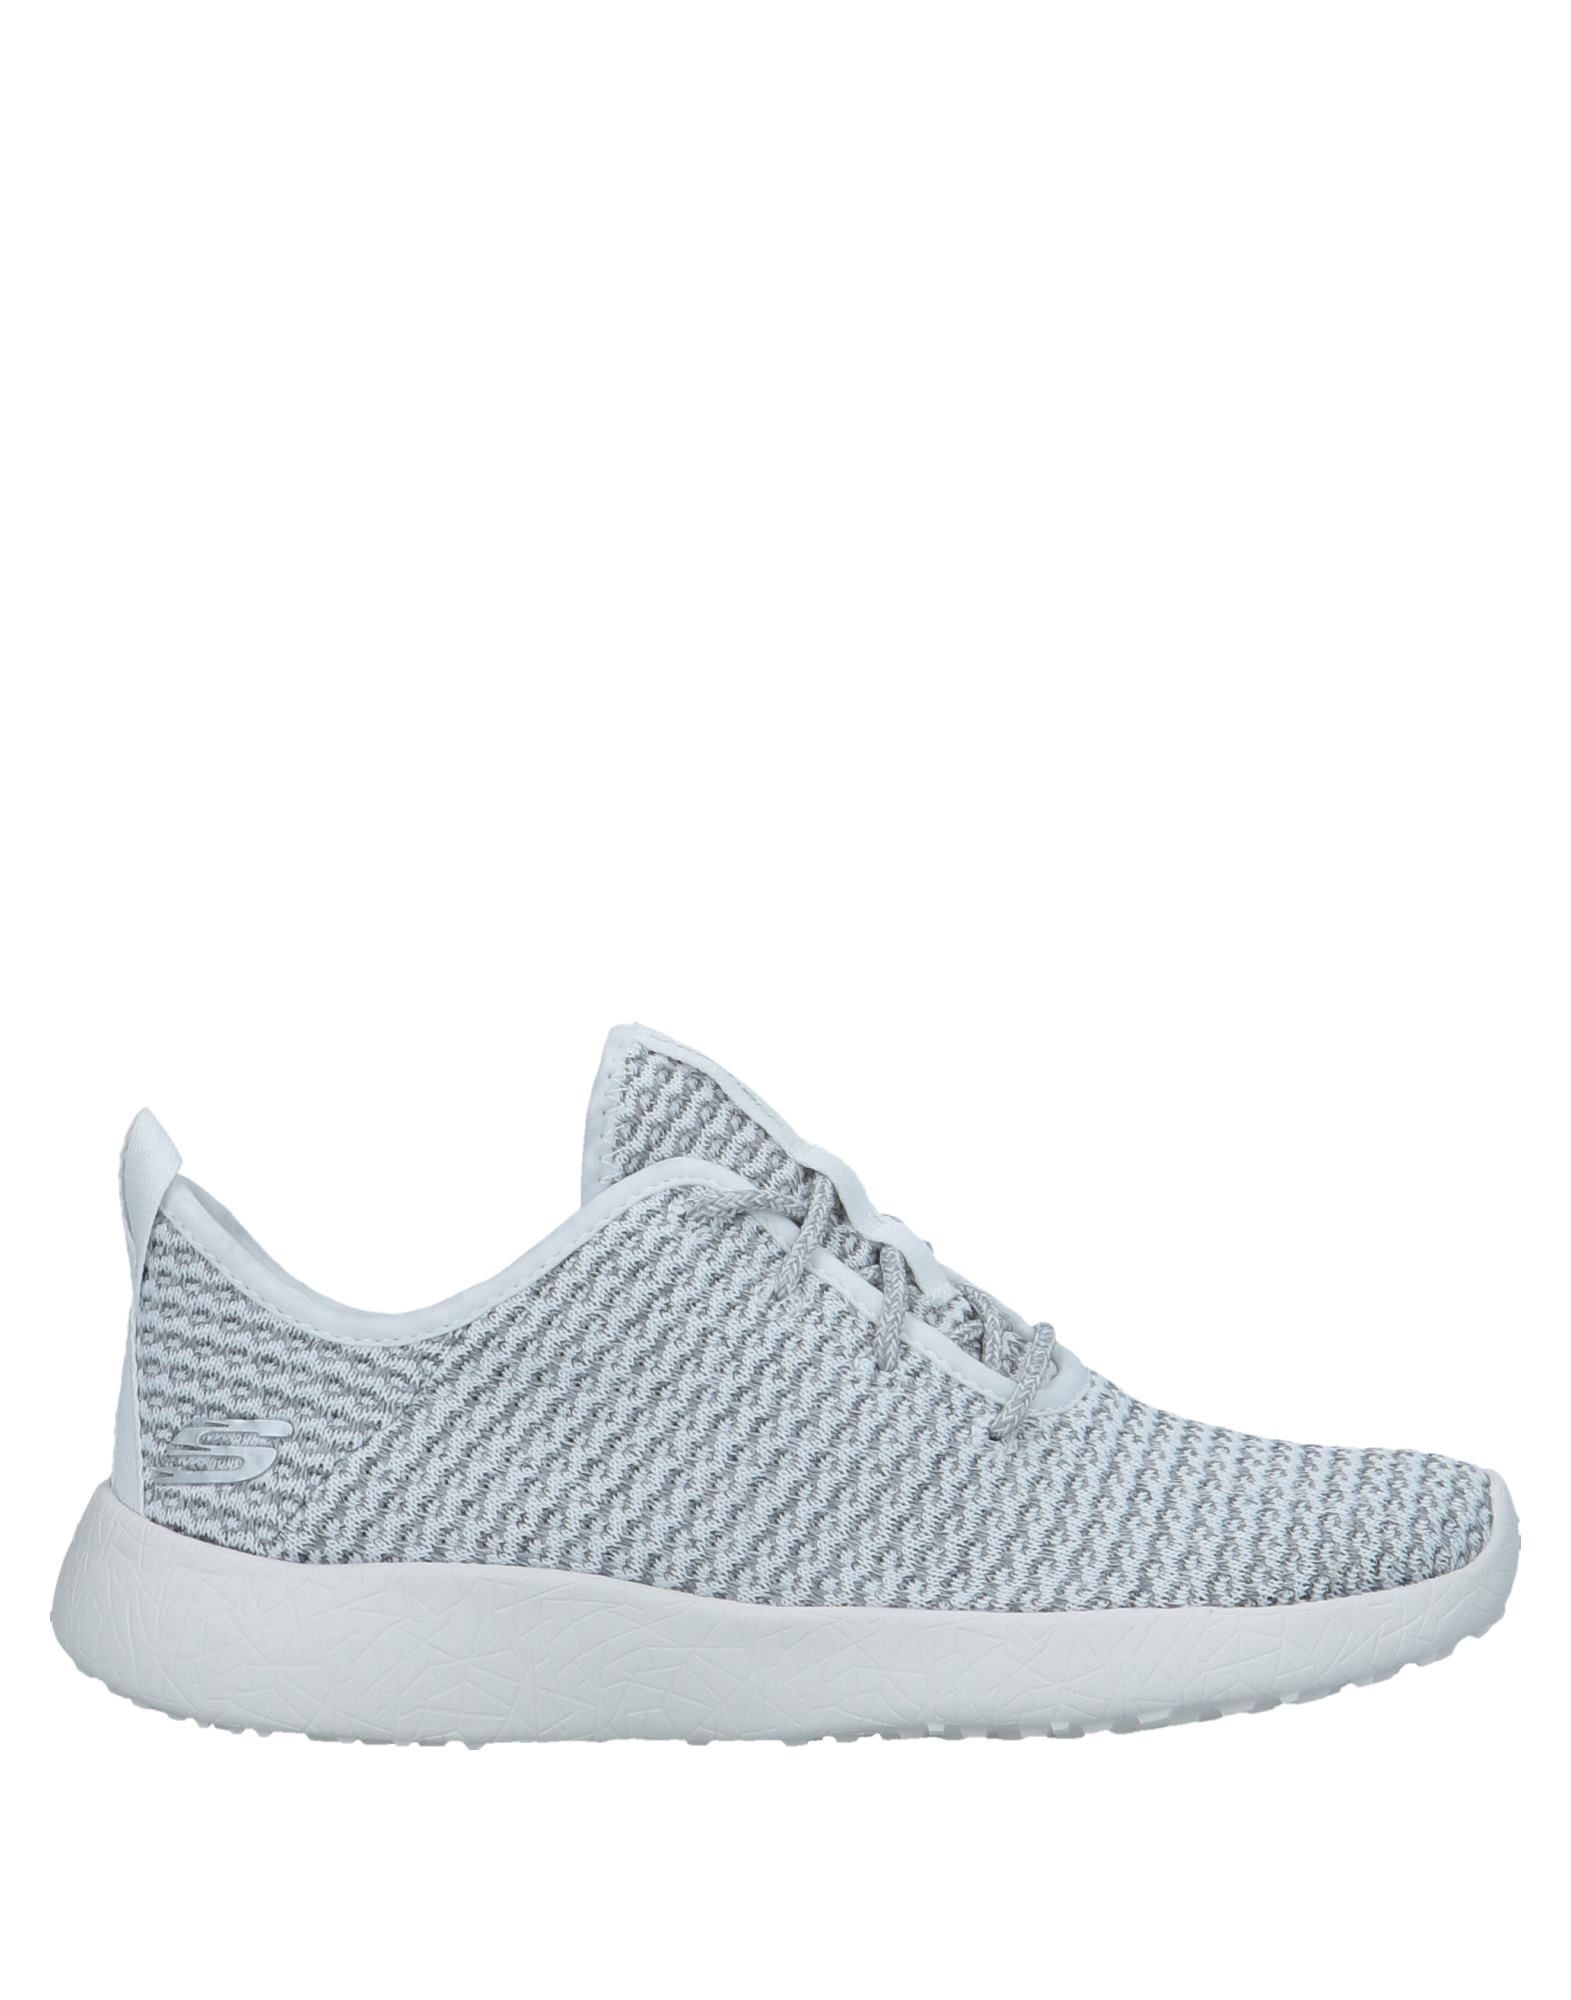 Skechers Sneakers Damen  11529062QF Gute Qualität beliebte Schuhe